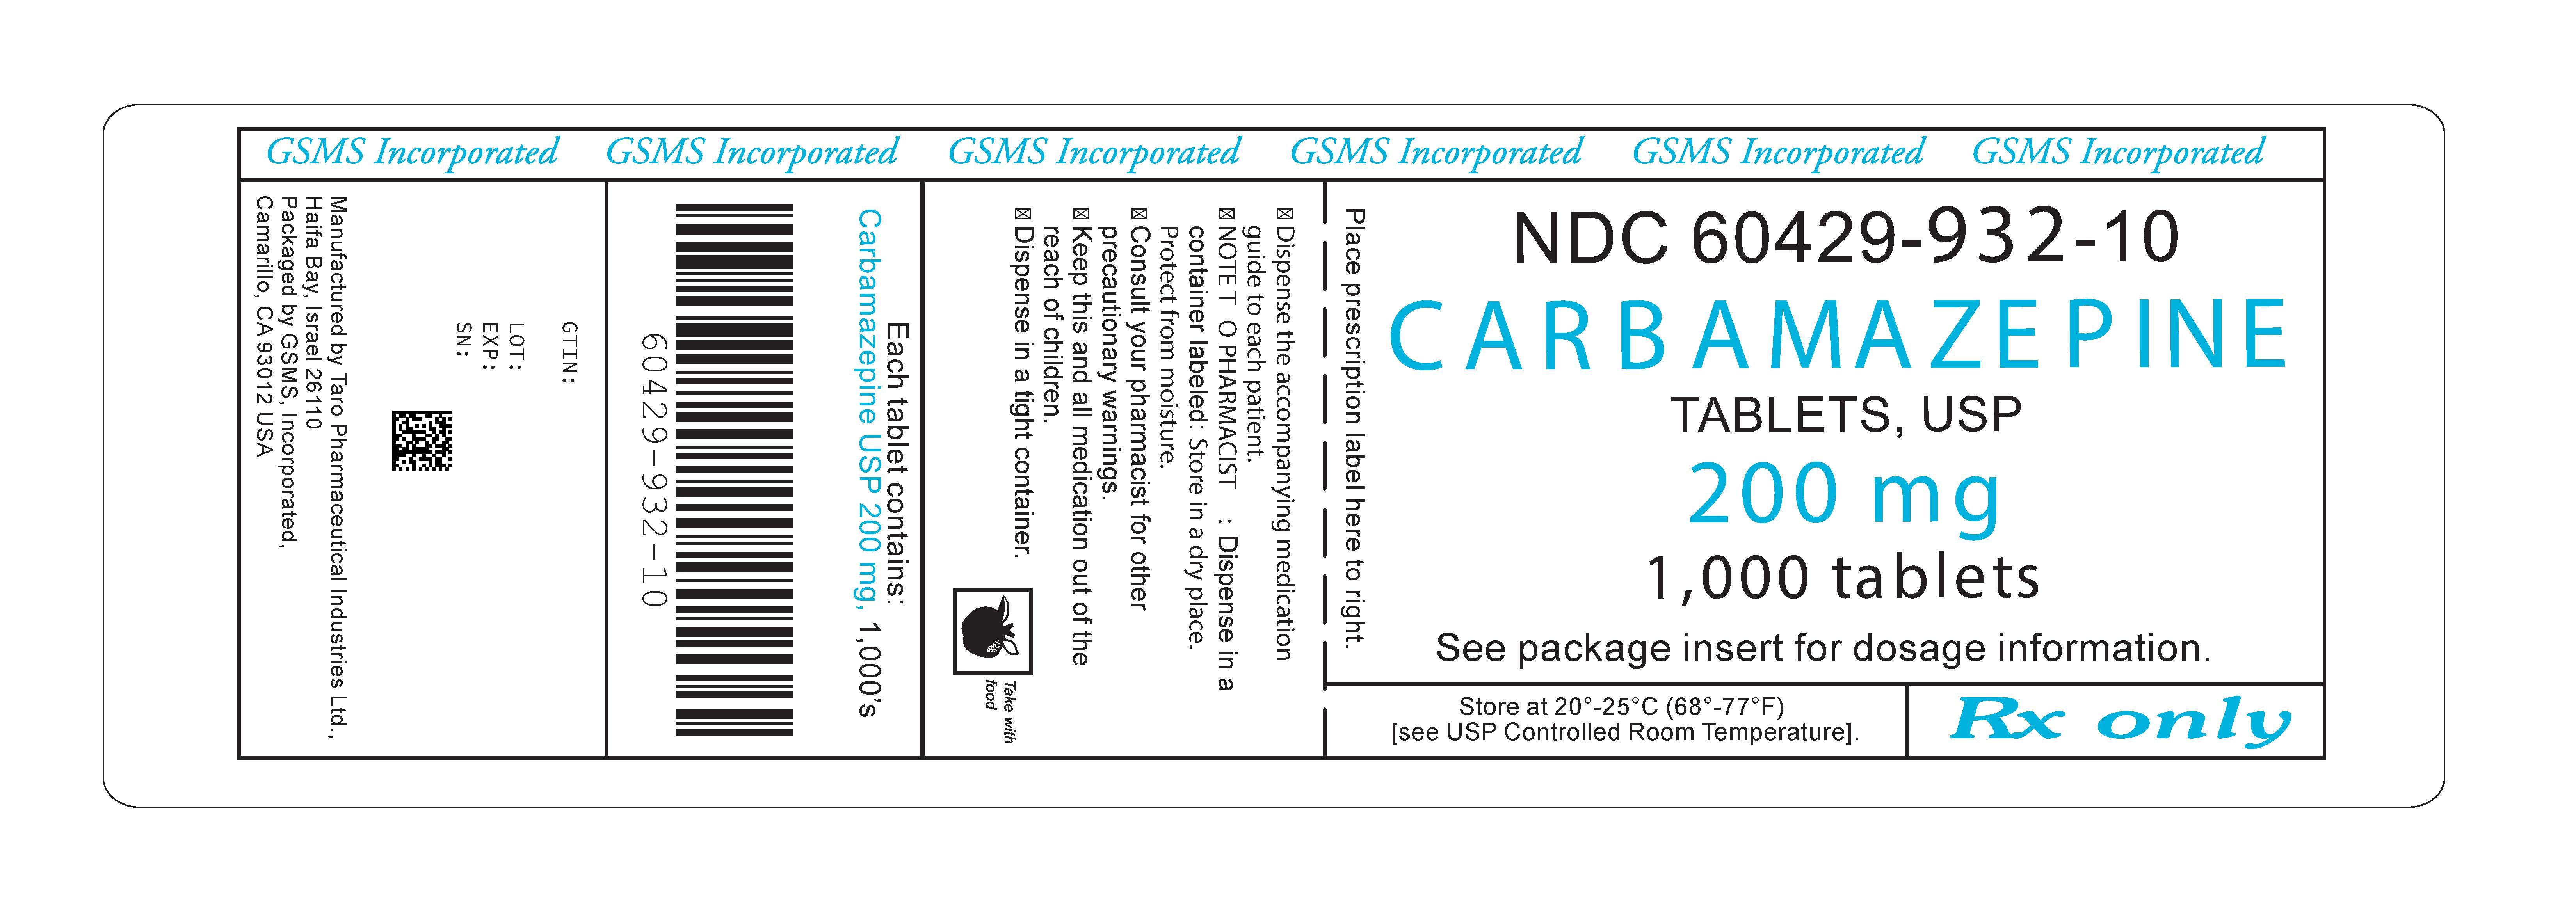 60429-932-10OL - CARBAMAZEPINE 200 MG TABLETS - REV MAY 2011 PMG MAY 2011.jpg